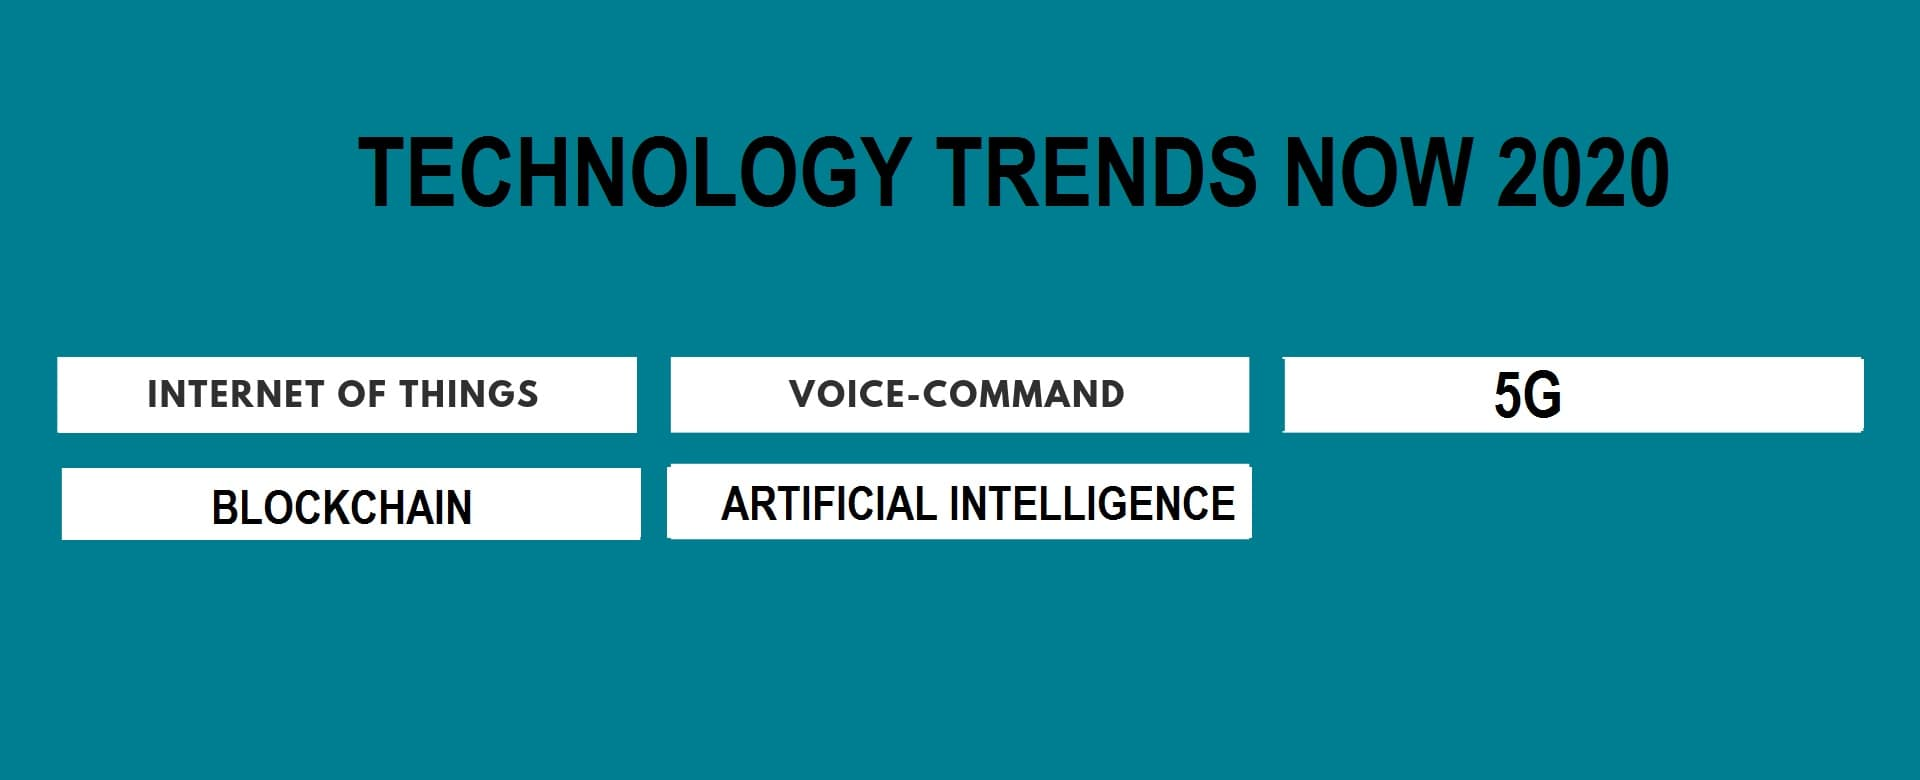 technology trends 2020